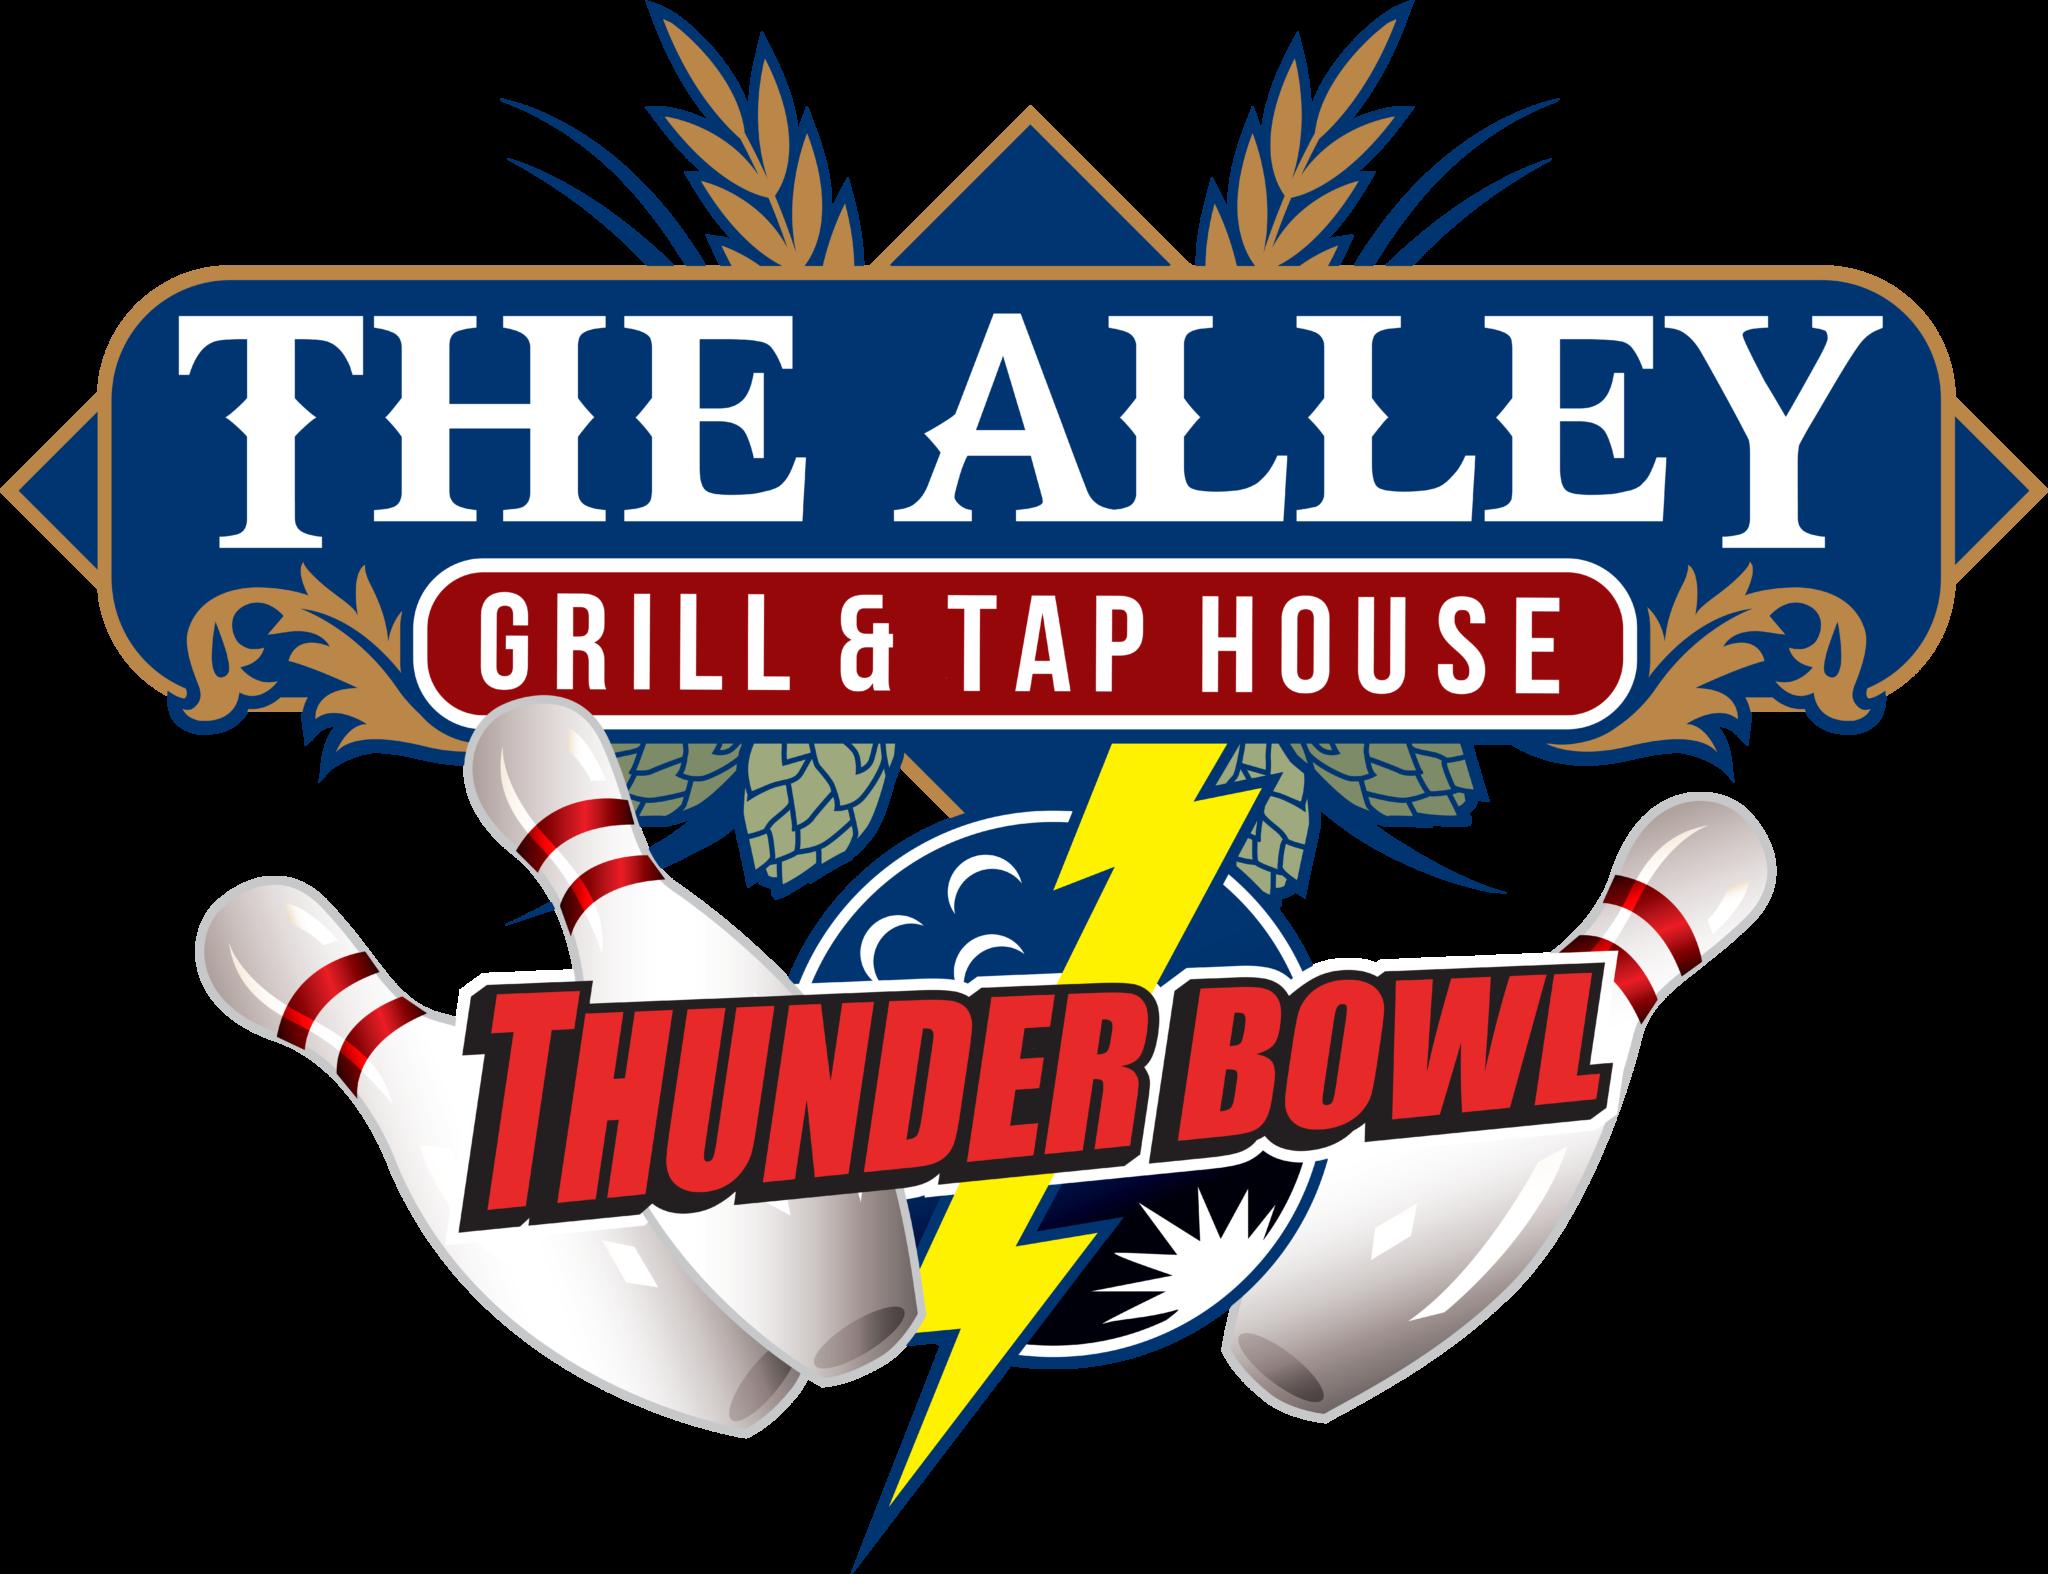 alley thunder combo logo gp-1 (1) 5-2018